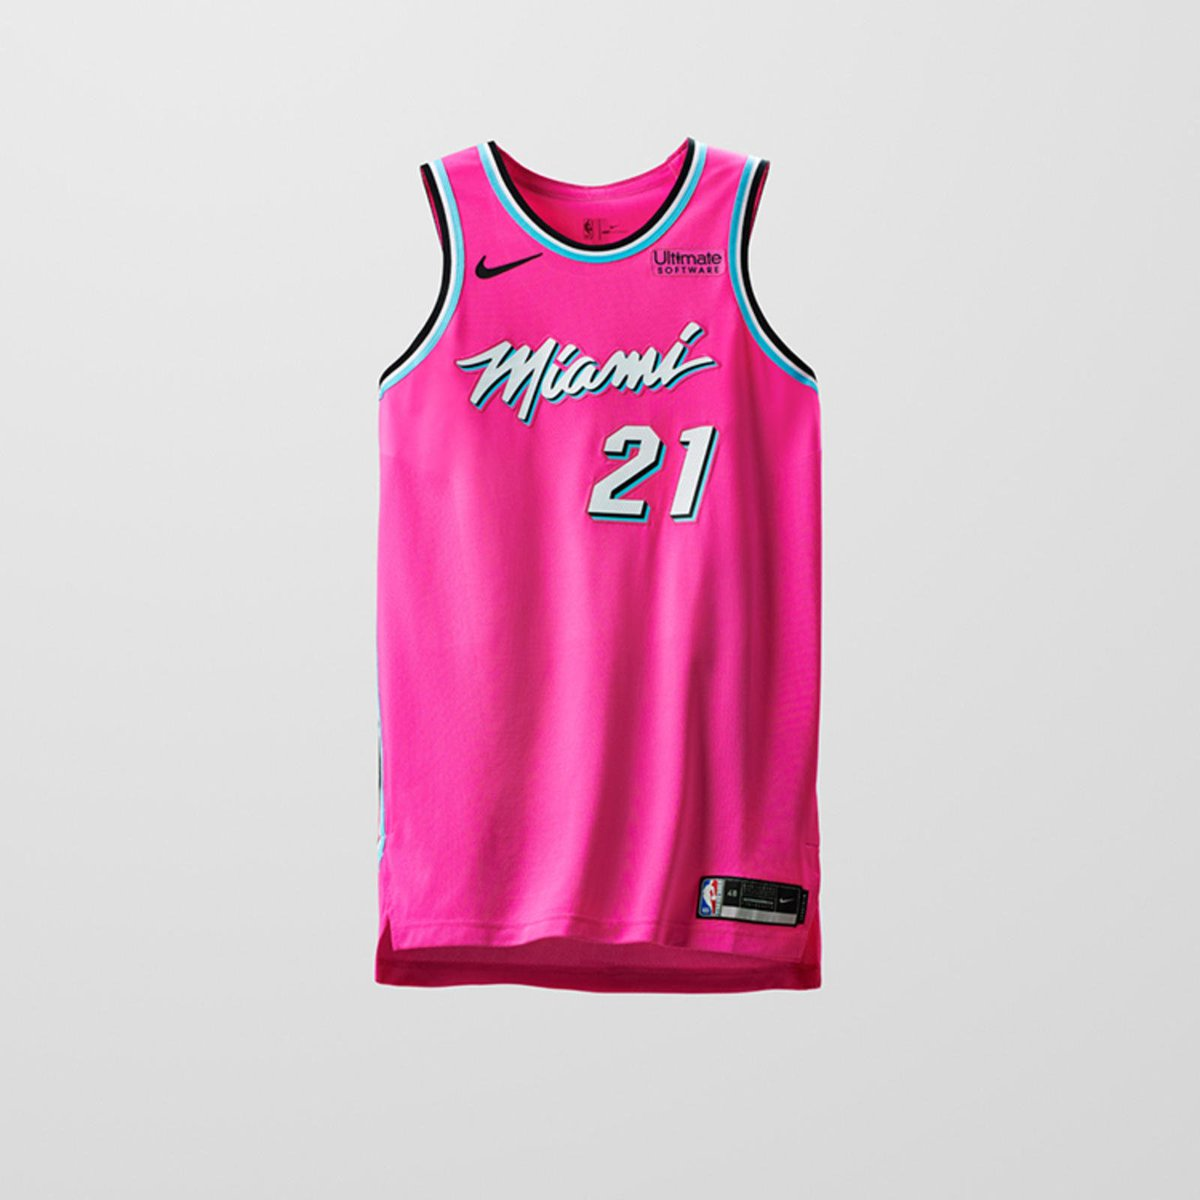 new arrival f9fd9 6c7e9 NBA UK on Twitter: